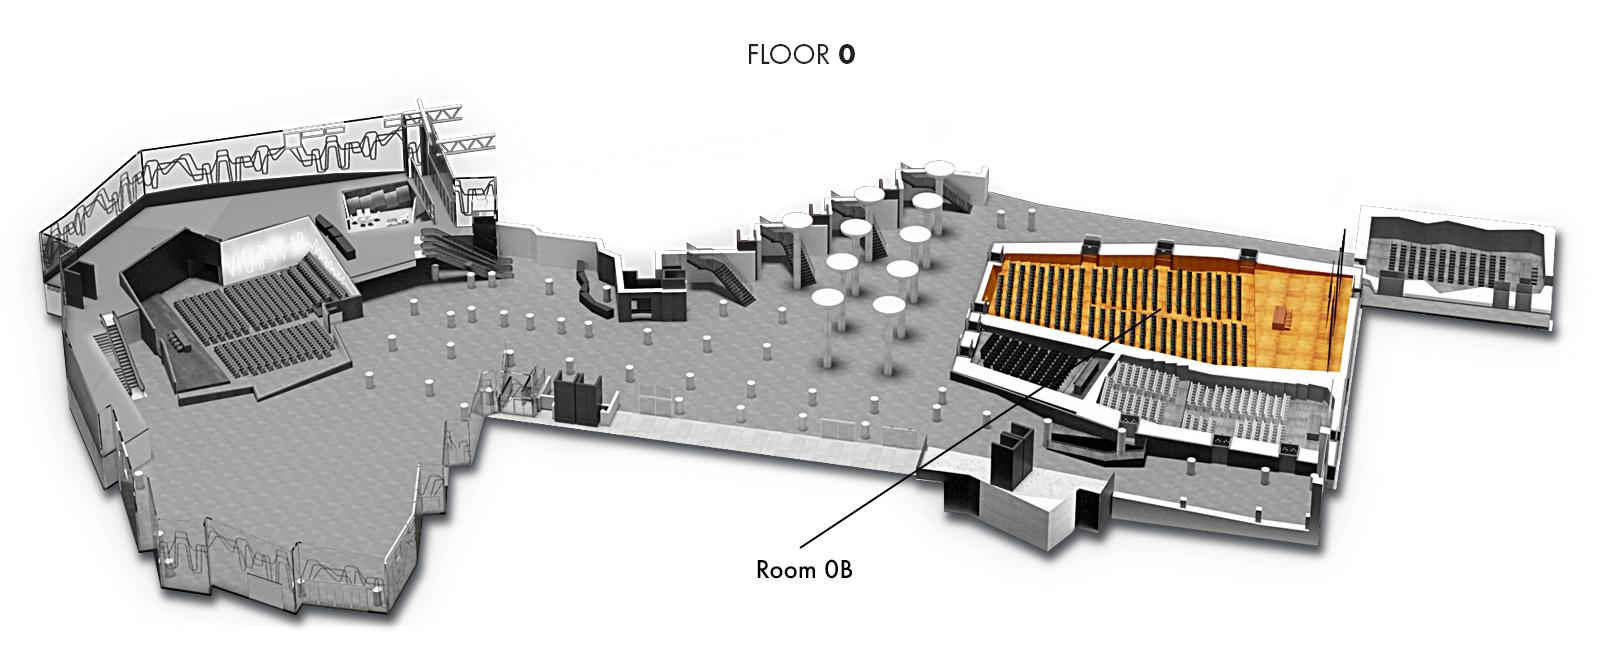 Room 0B, Floor 0 | Palacio Euskalduna Jauregia